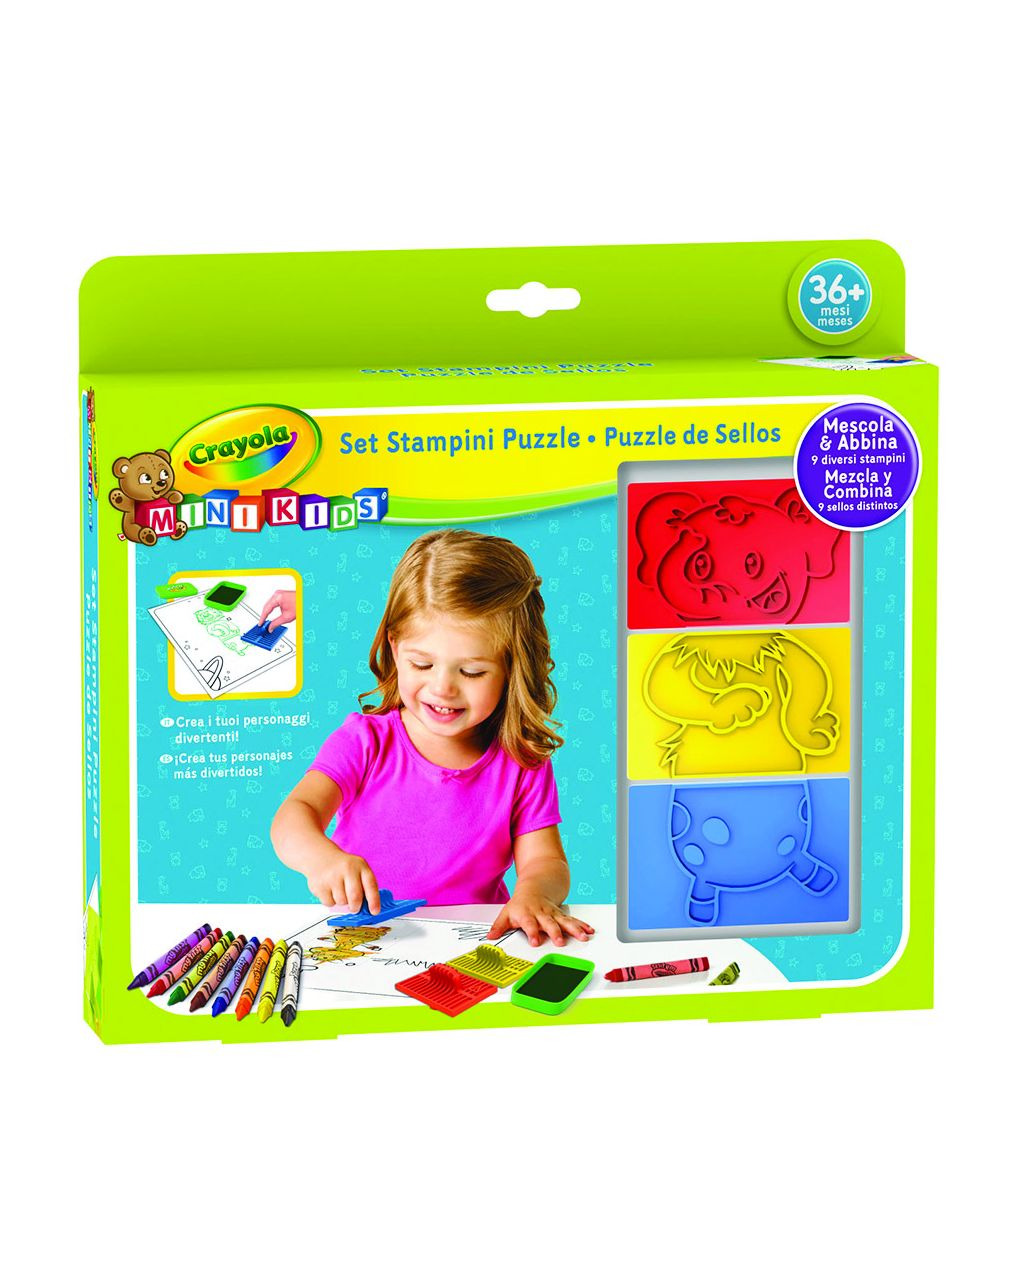 Crayola - set stampini puzzle mini kids - Crayola